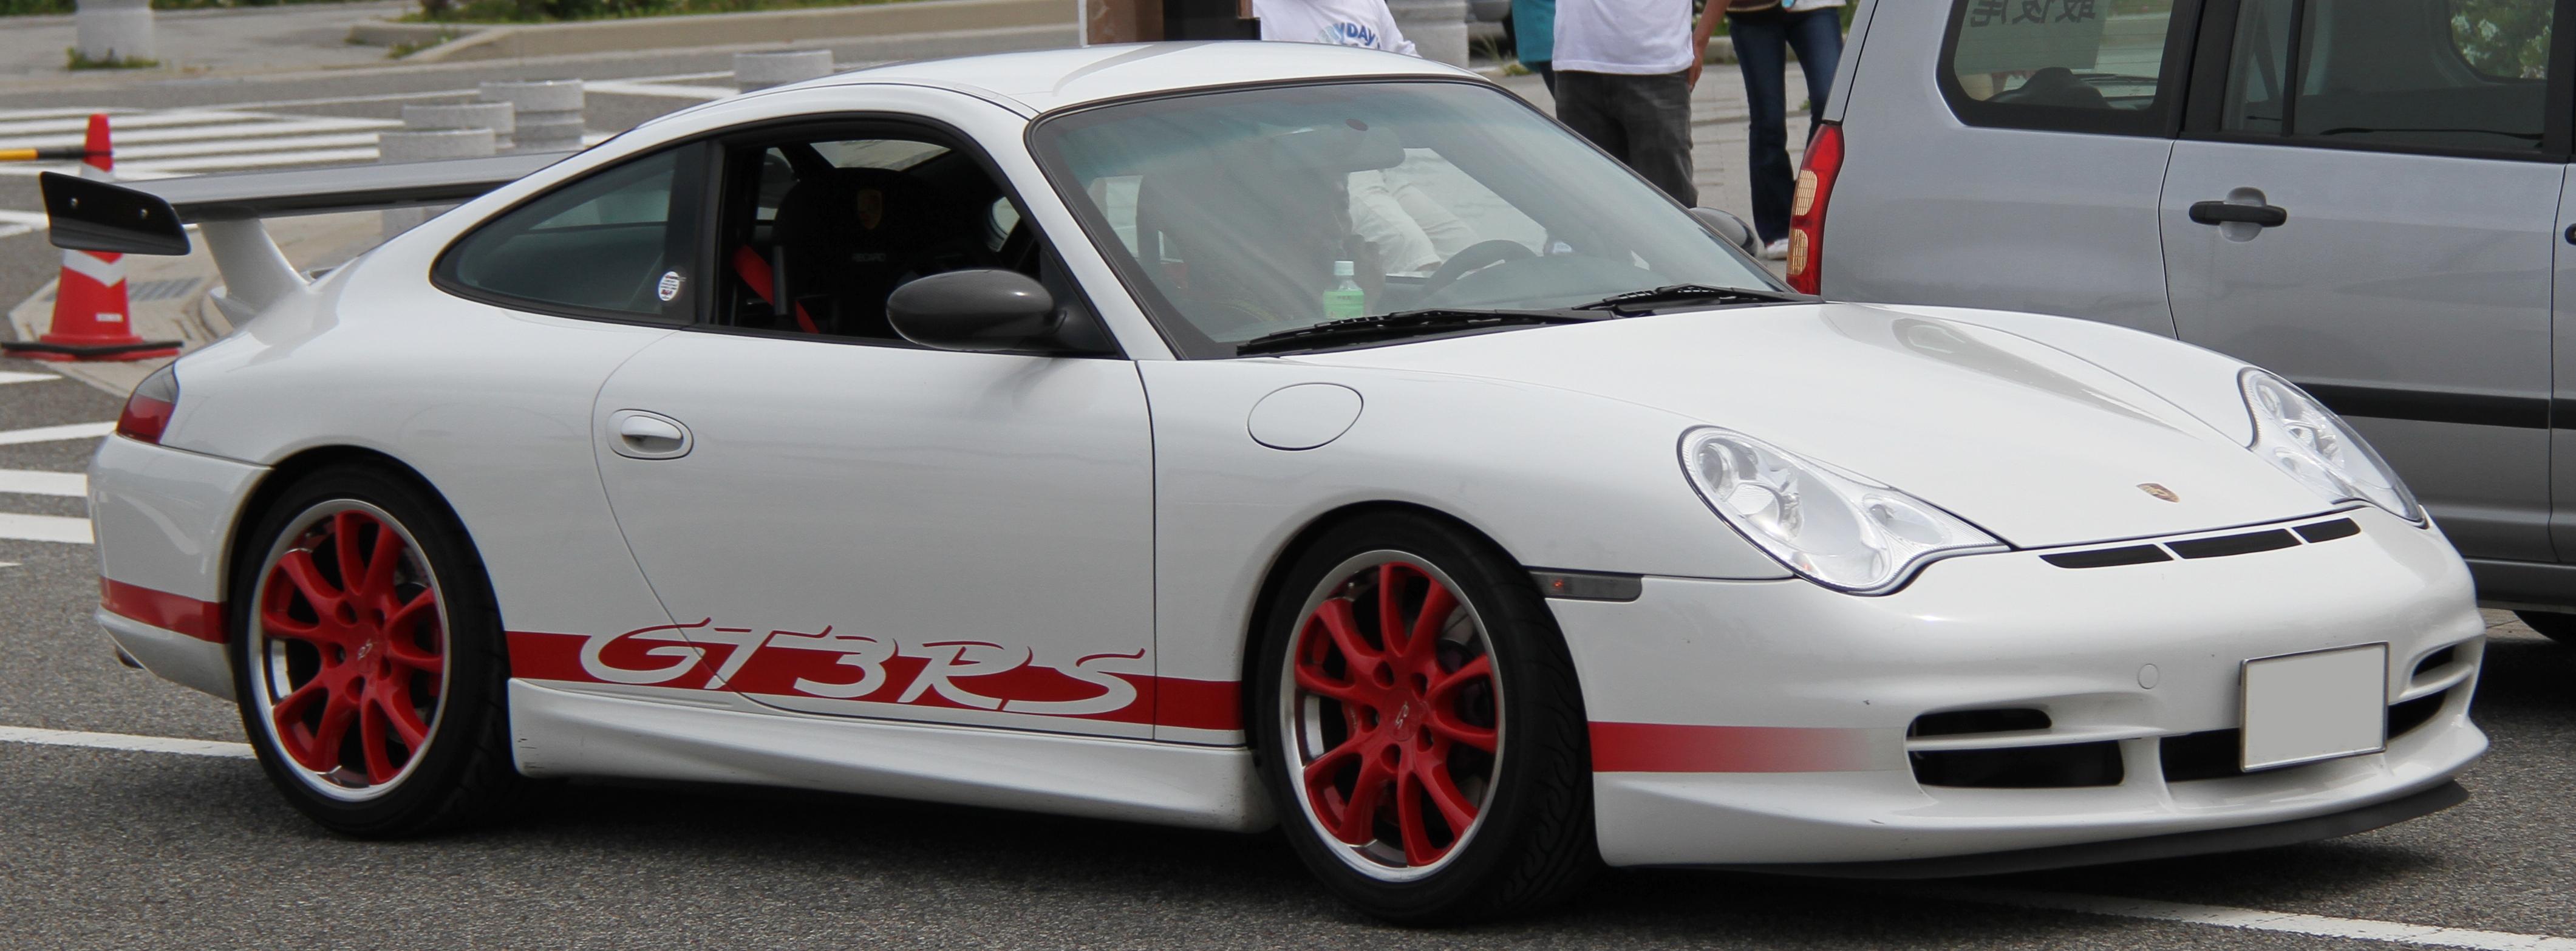 File Porsche 996 Gt3 Rs 01 Jpg Wikimedia Commons